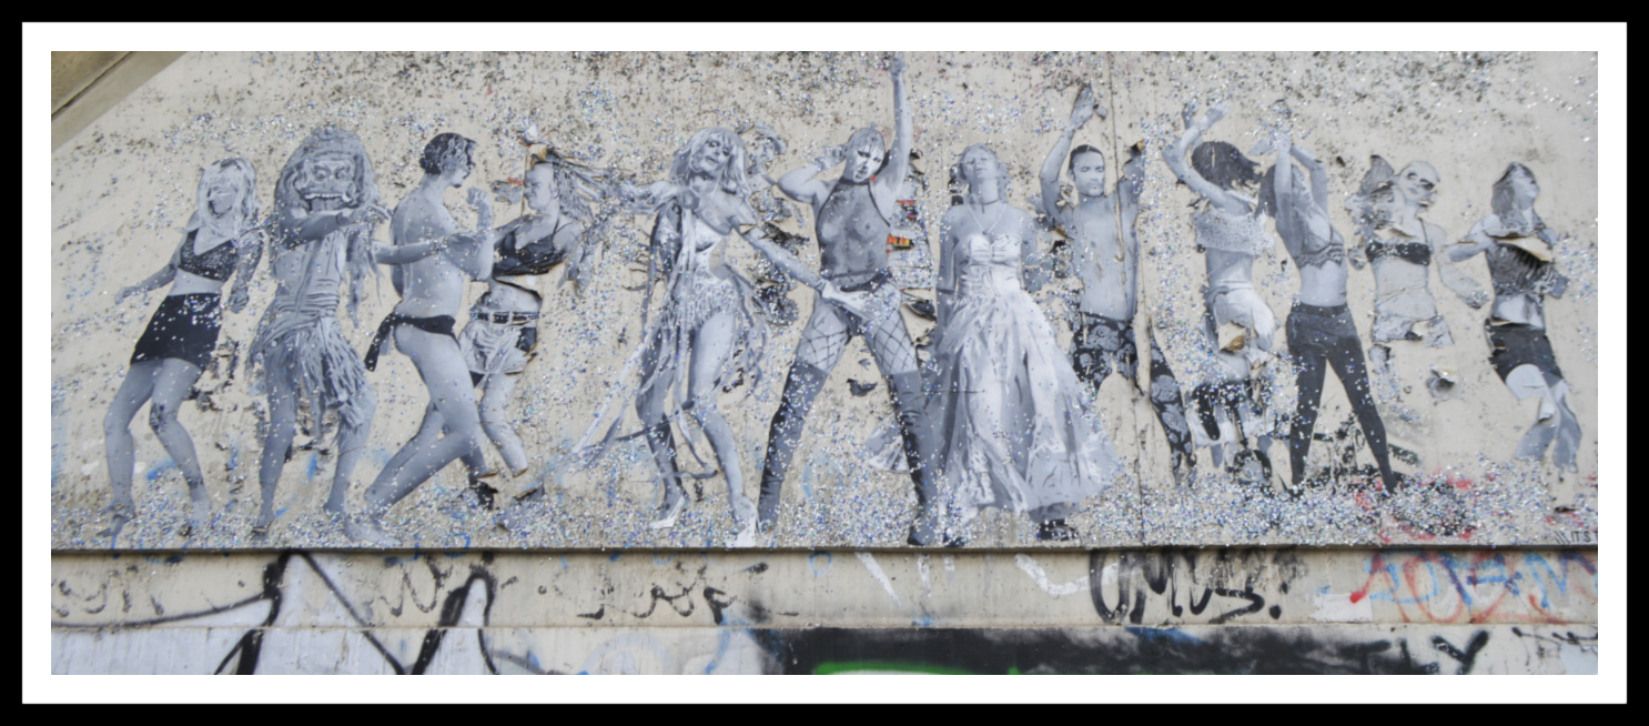 bekitschchig blog street art photography February 2021 Lockdown Berlin